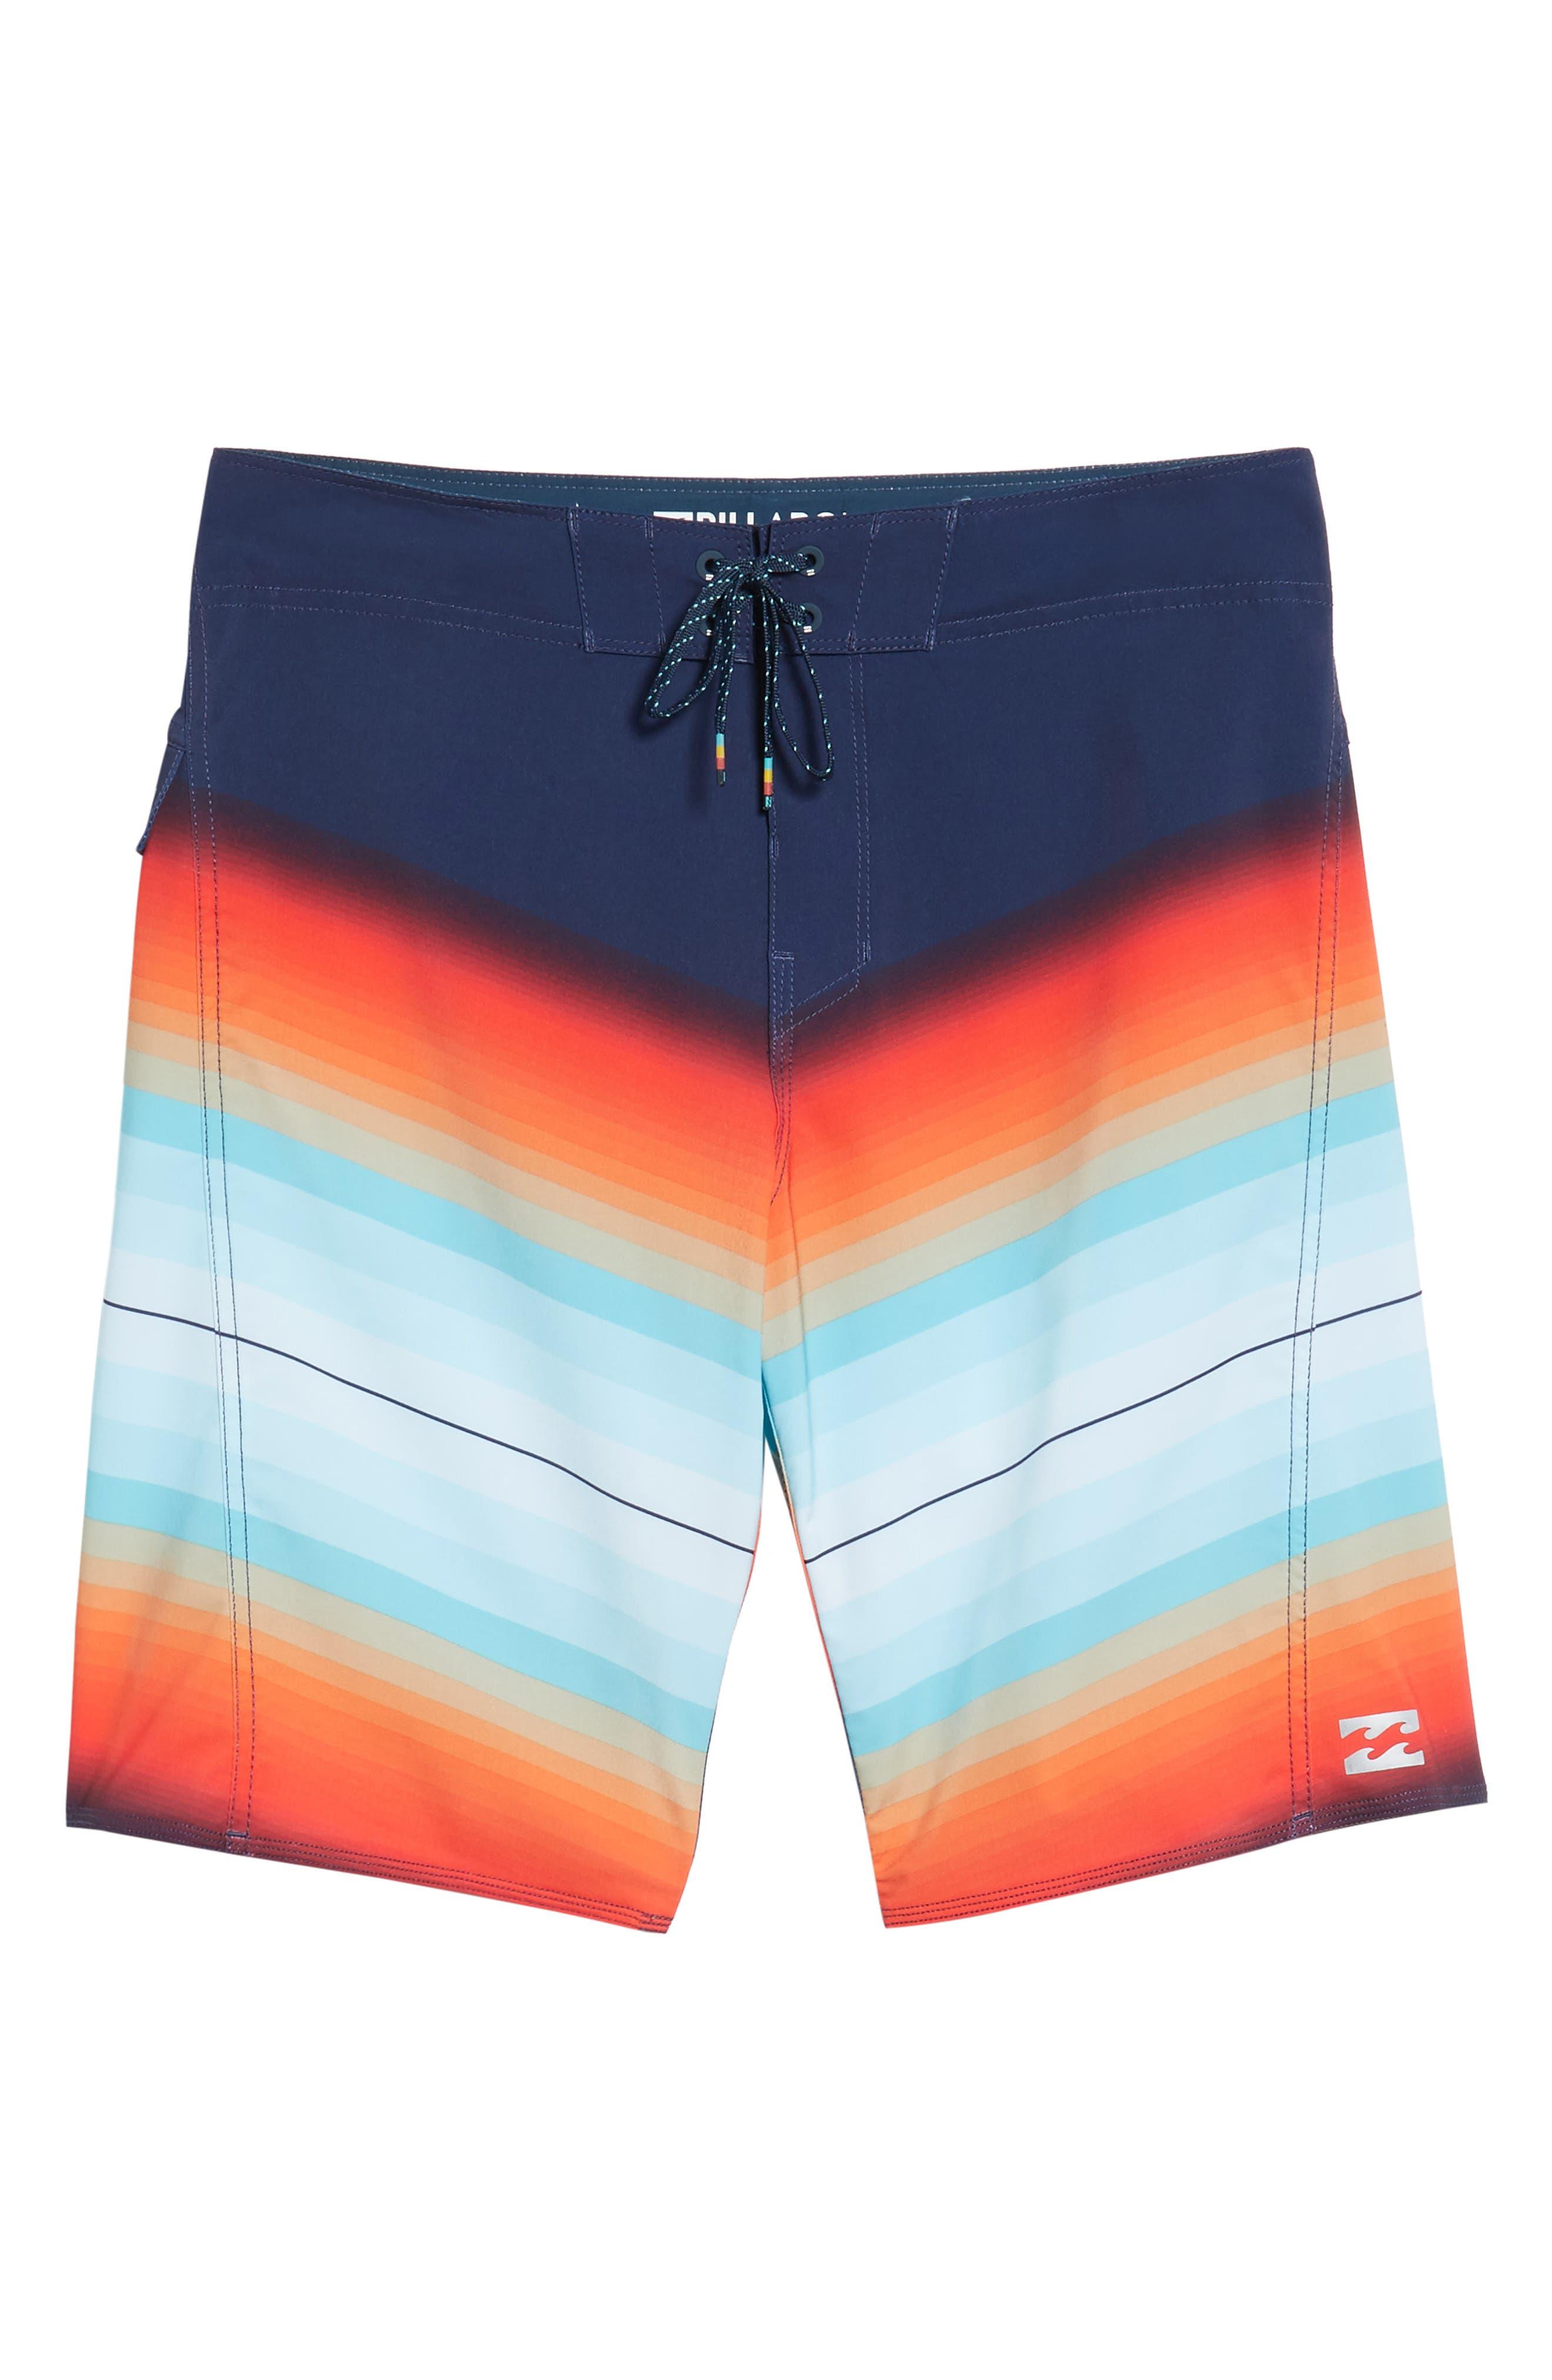 Fluid X Board Shorts,                             Alternate thumbnail 18, color,